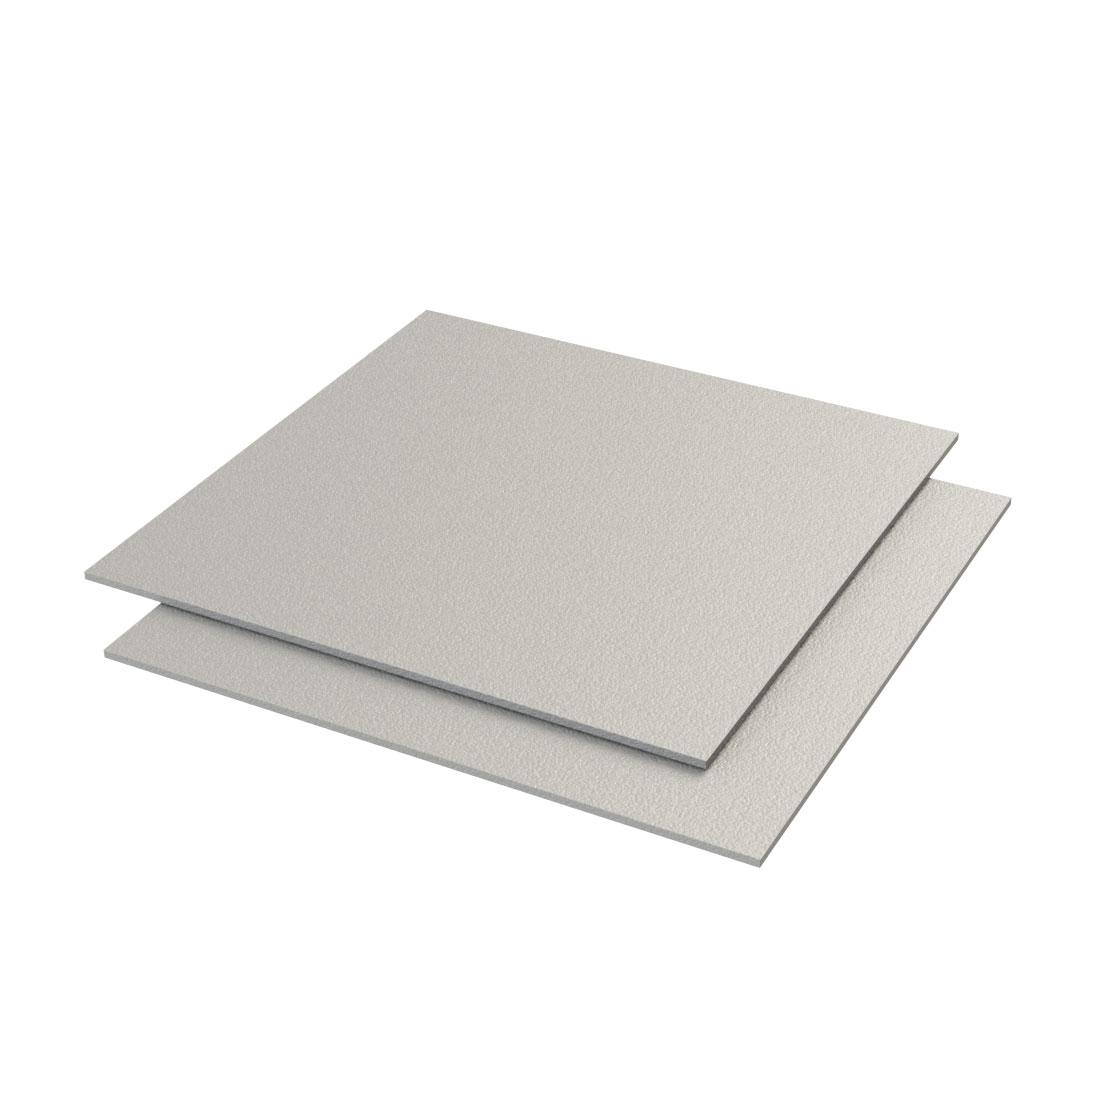 Lexan Cliniwall PC Plaat C6206 Medium grey Gy7g160 3050x1300x1,7mm 463284